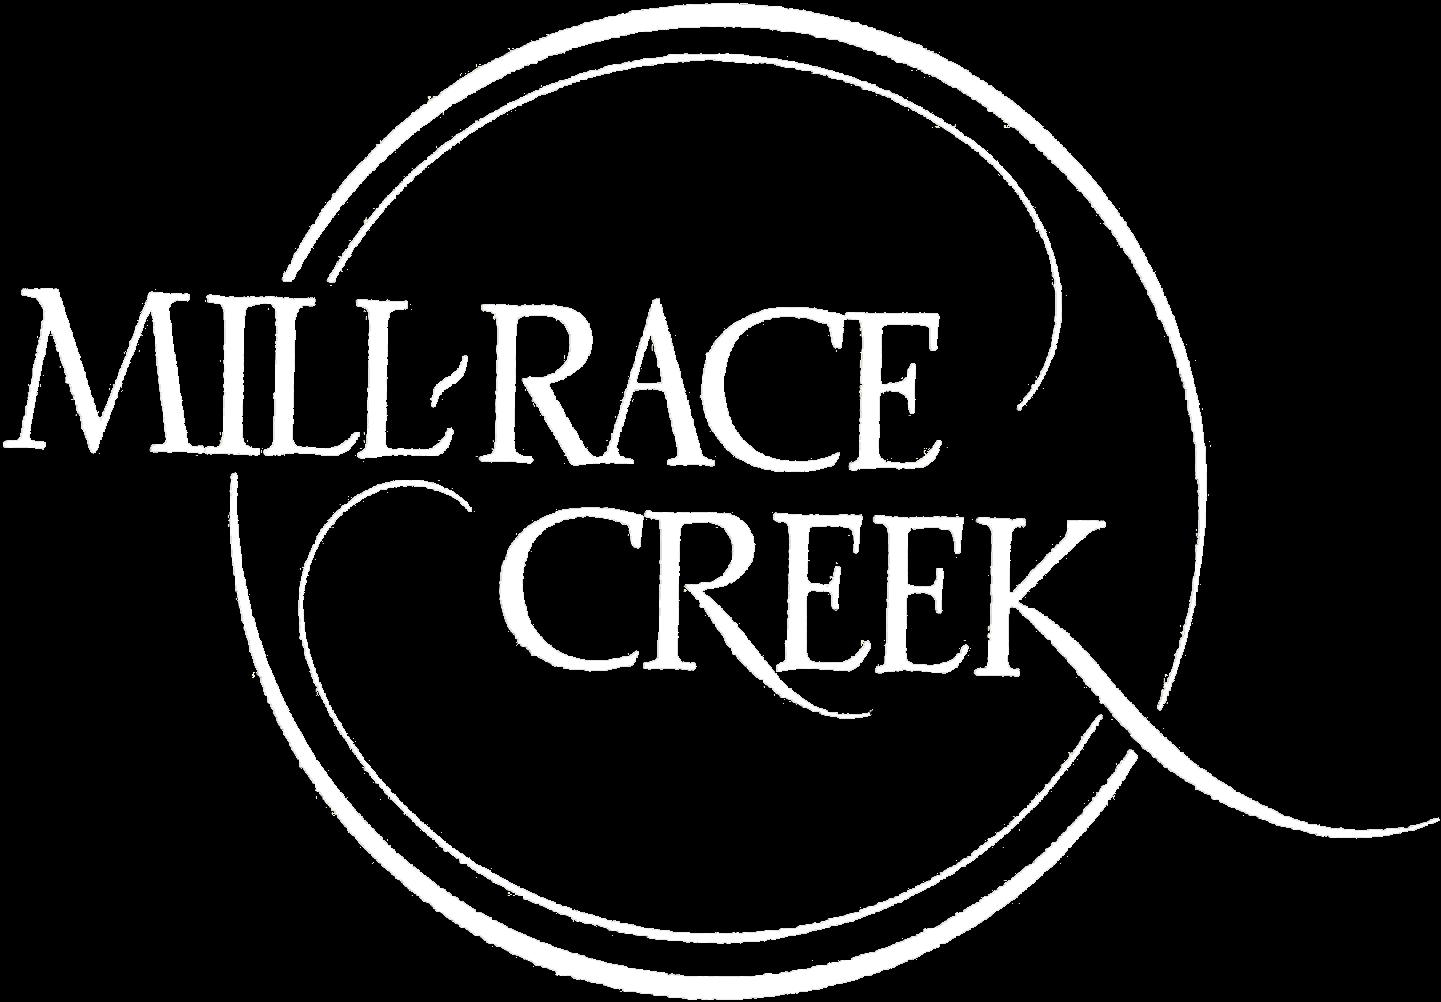 Mill Race Creek HOA